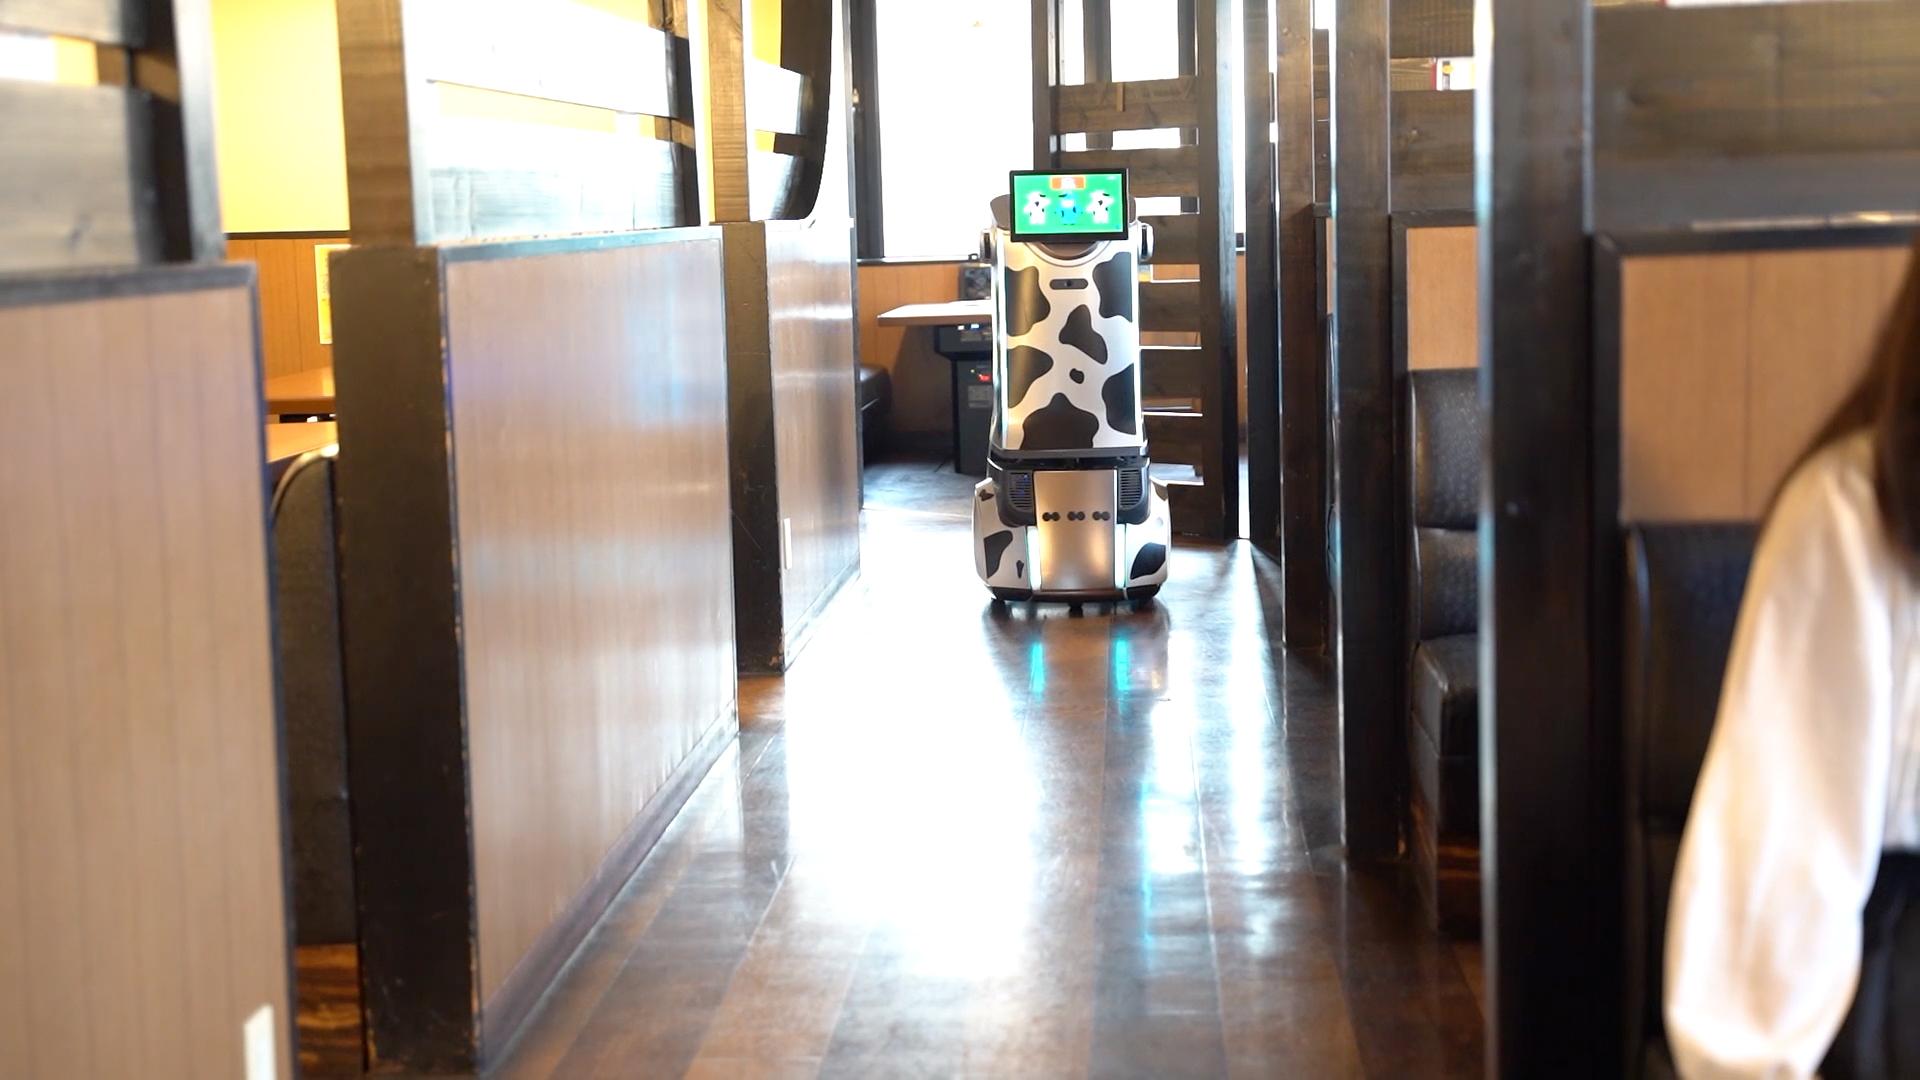 AIM ROBOT SAKURA